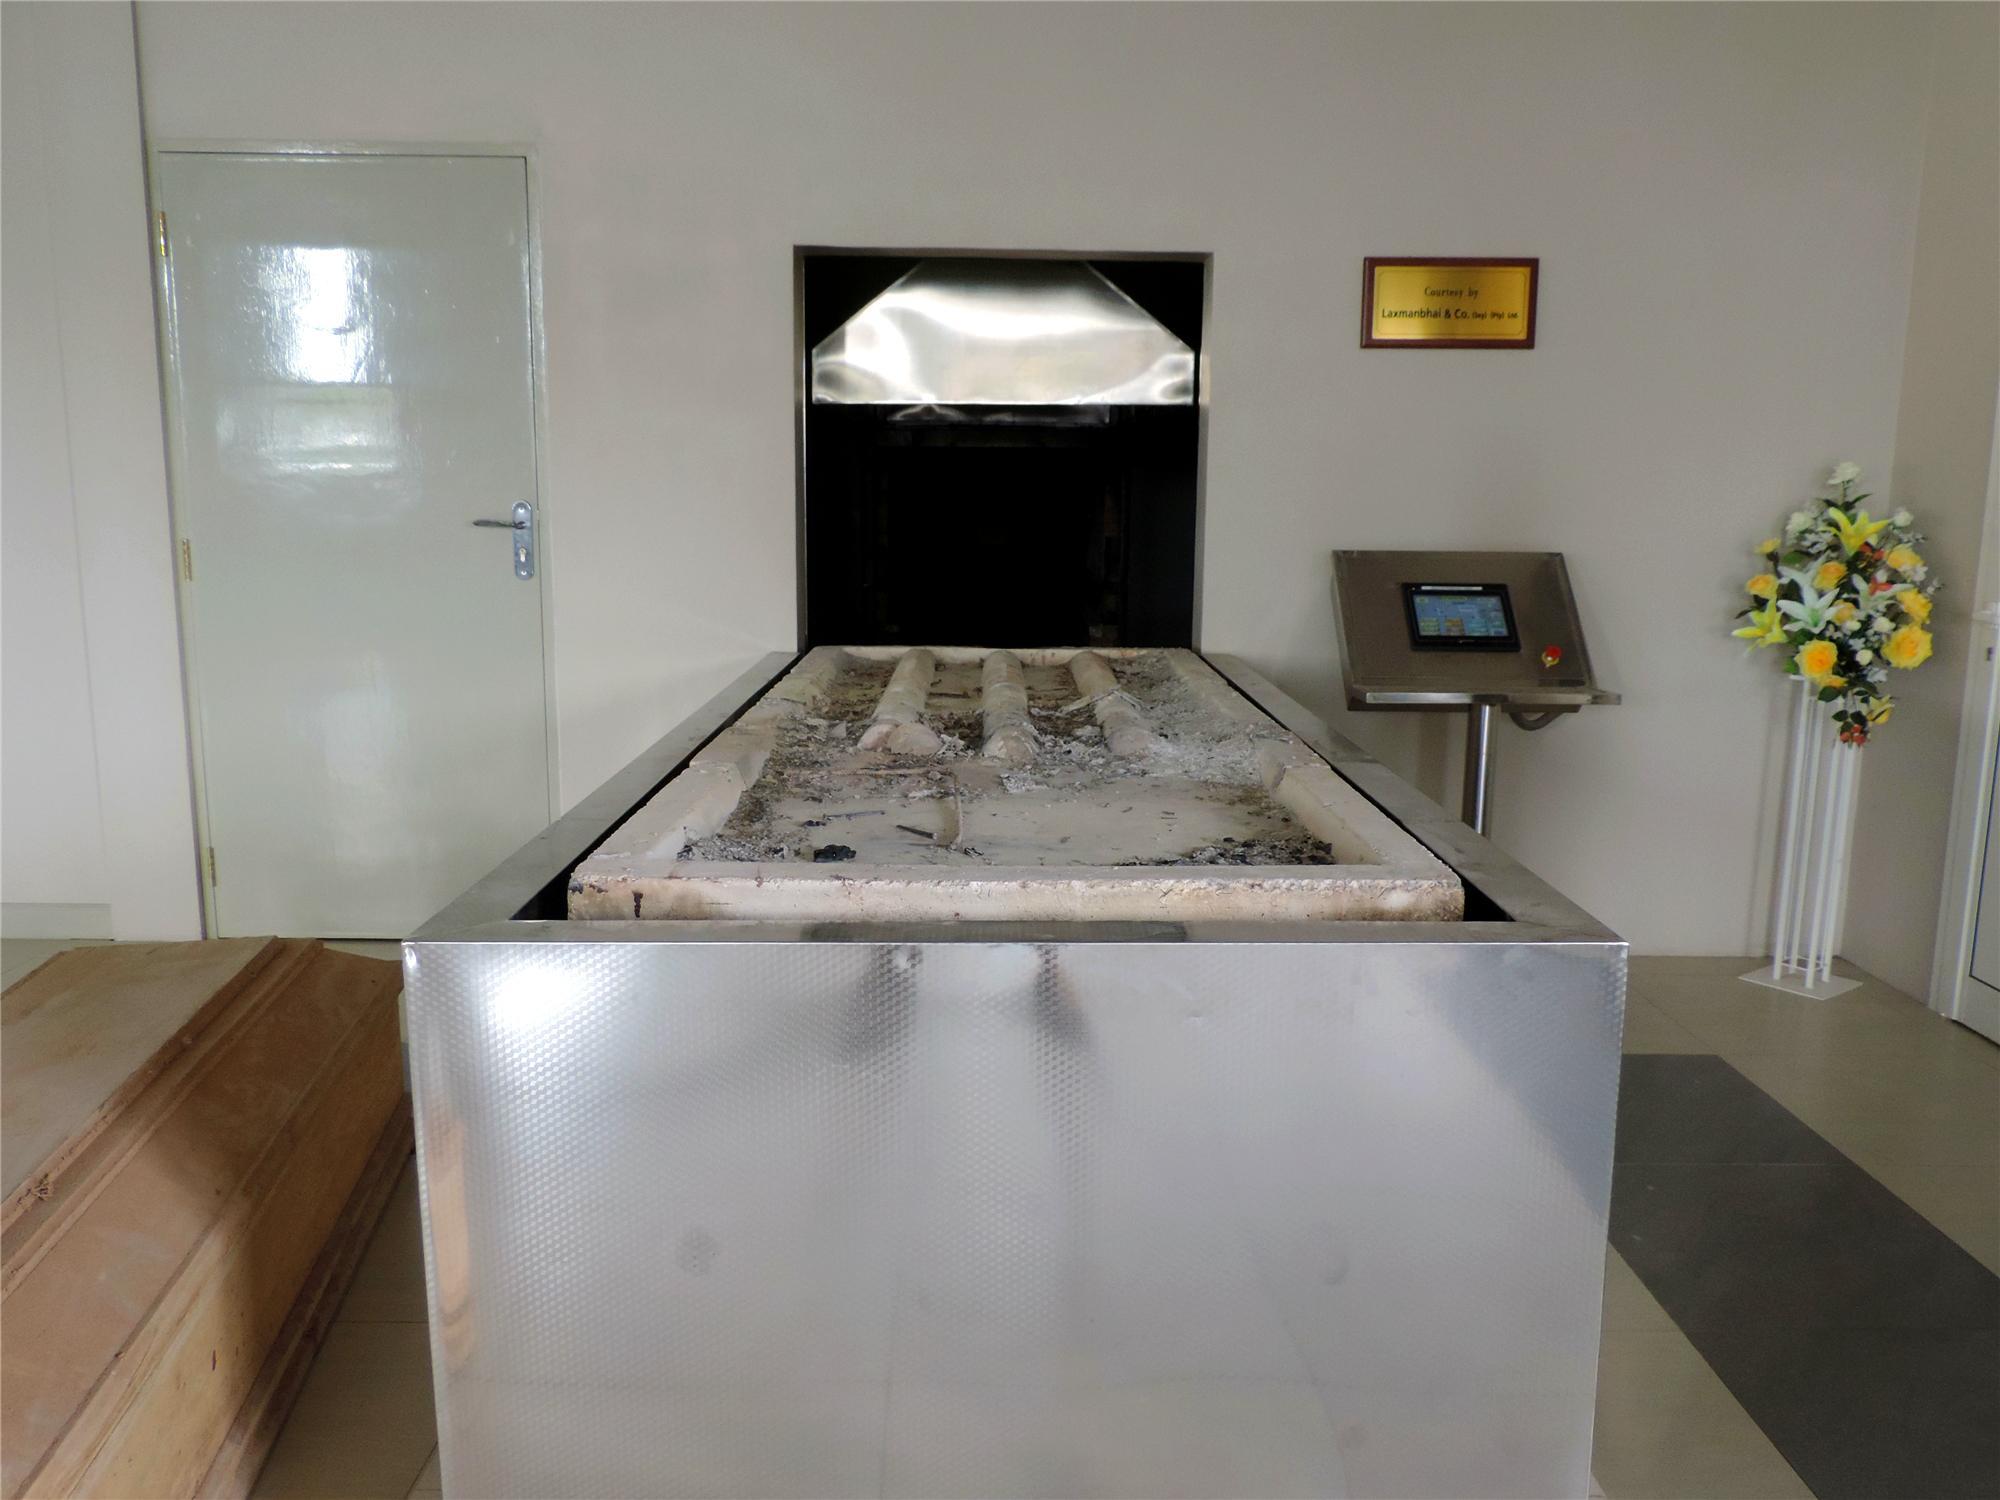 Equipo máquina crematorio from china de crematorio cremación 7